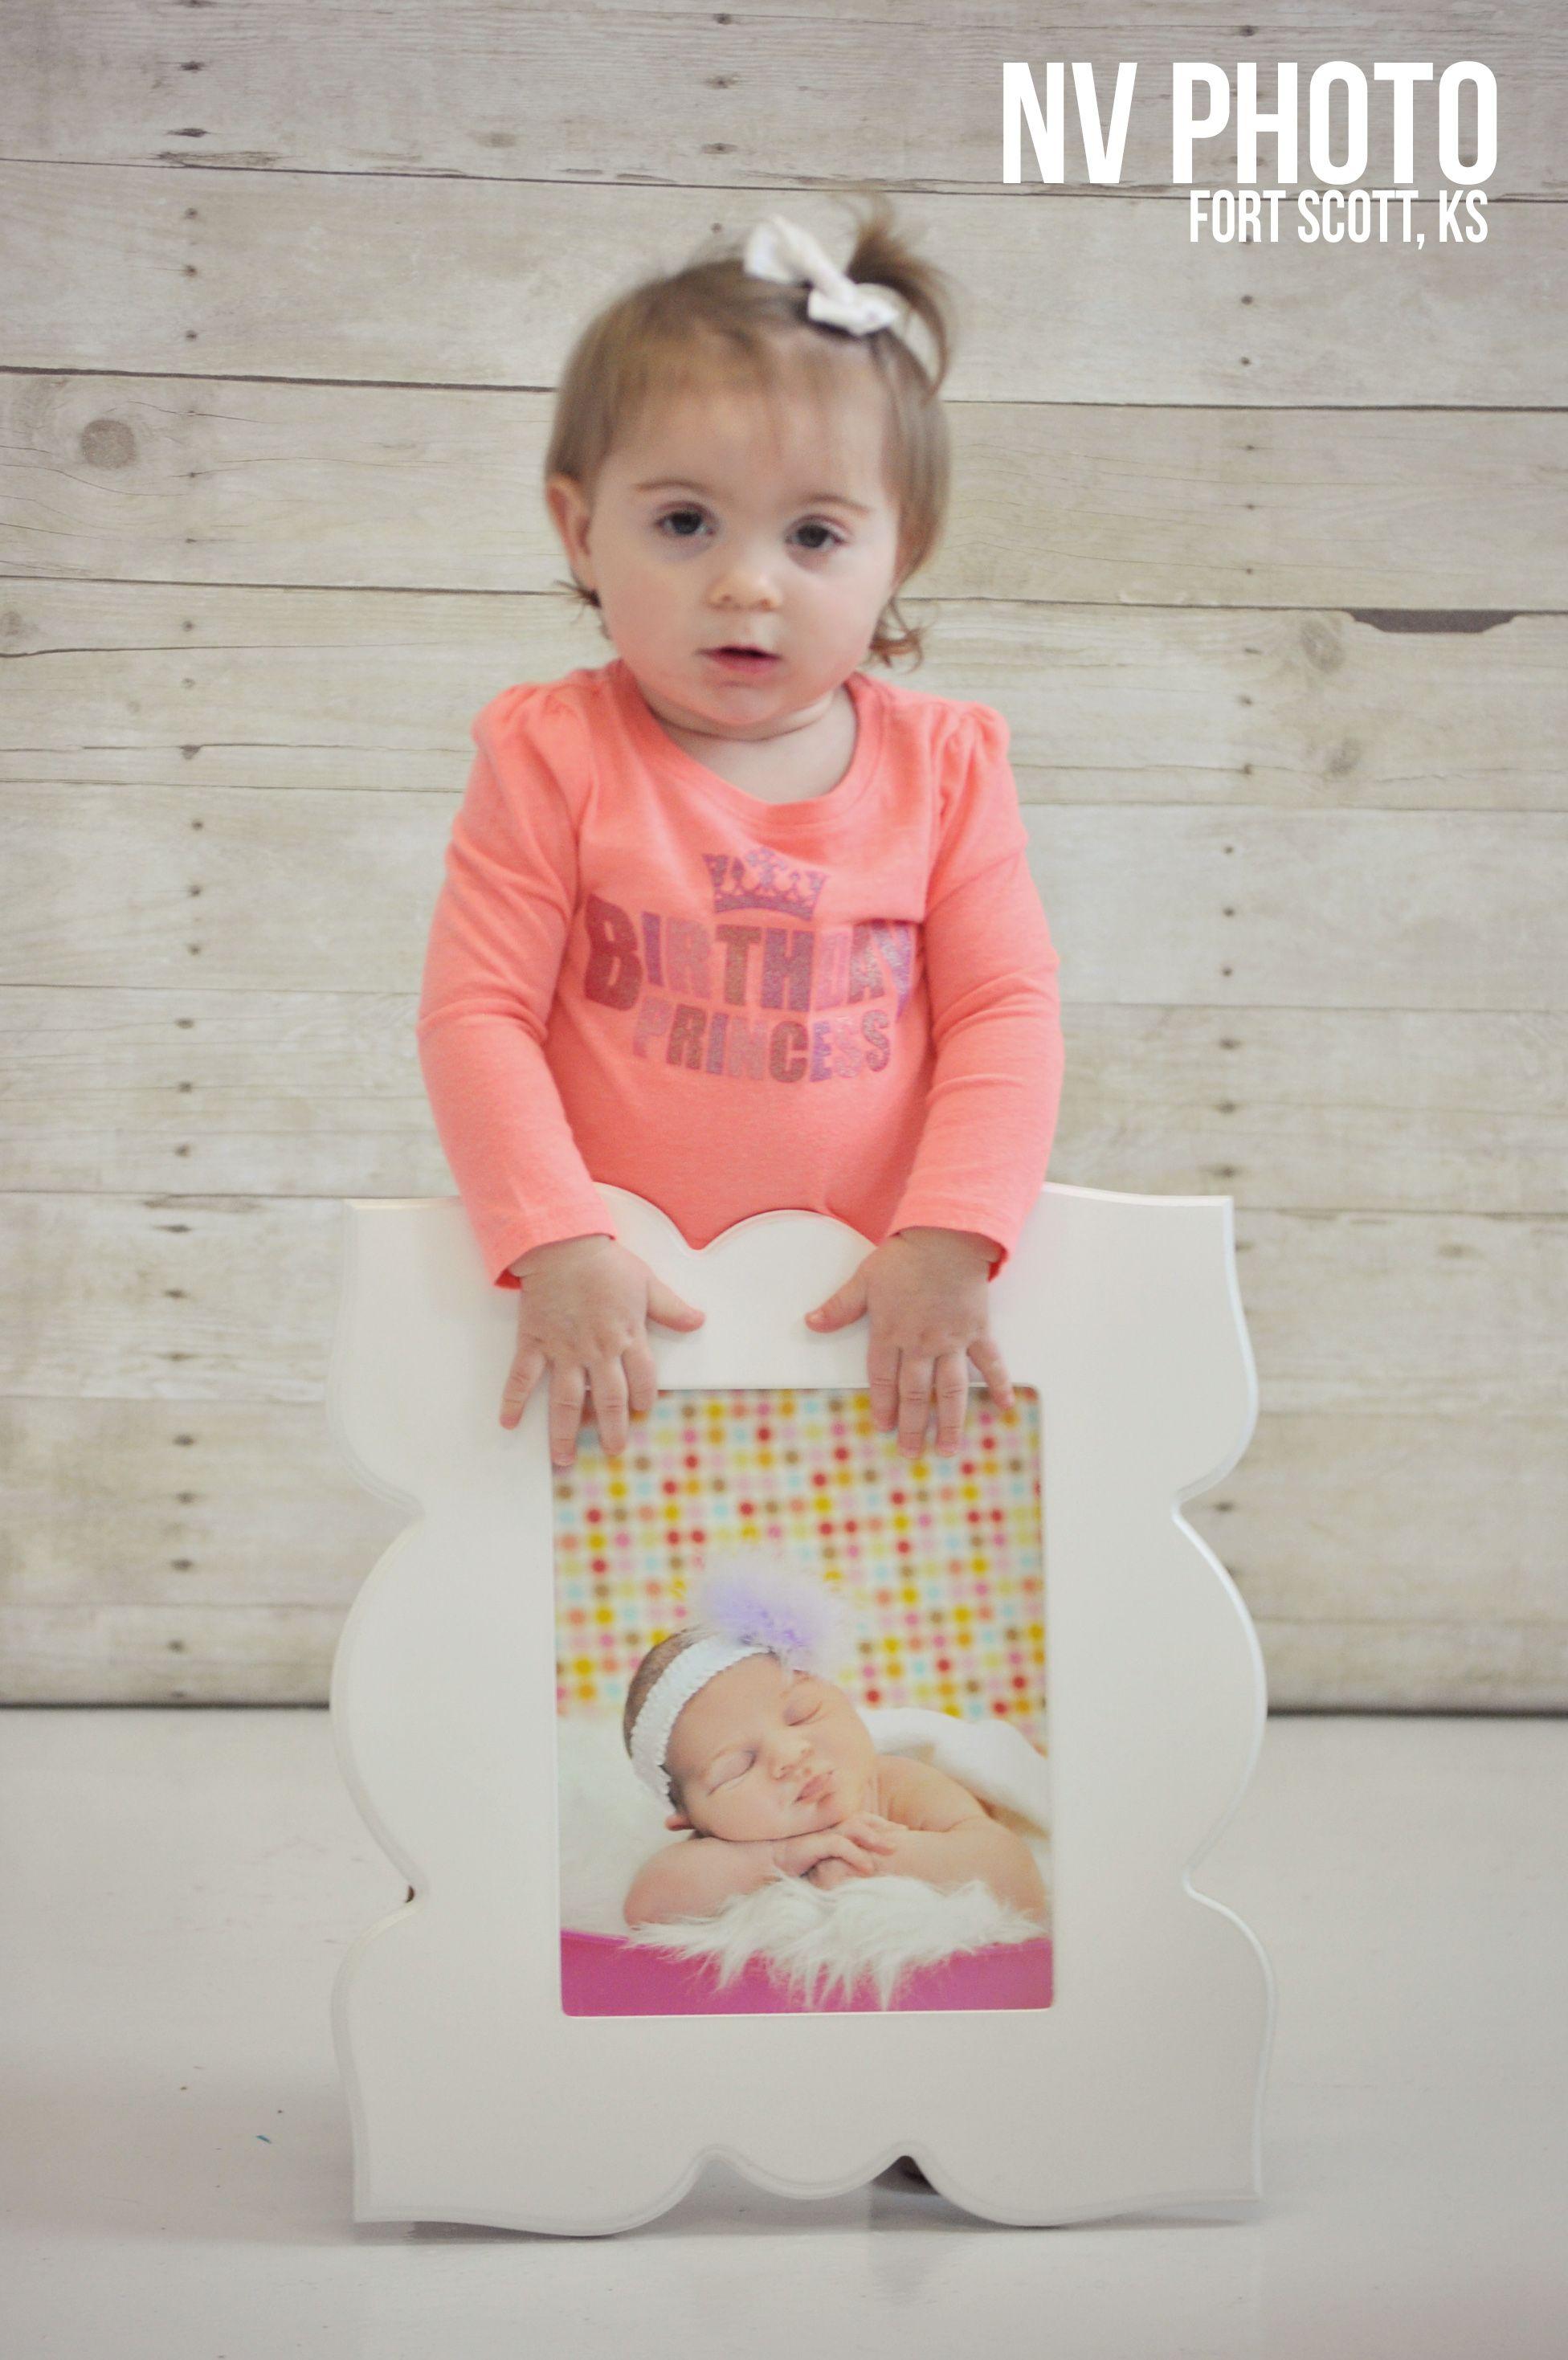 1st birthday photography holding newborn photo print